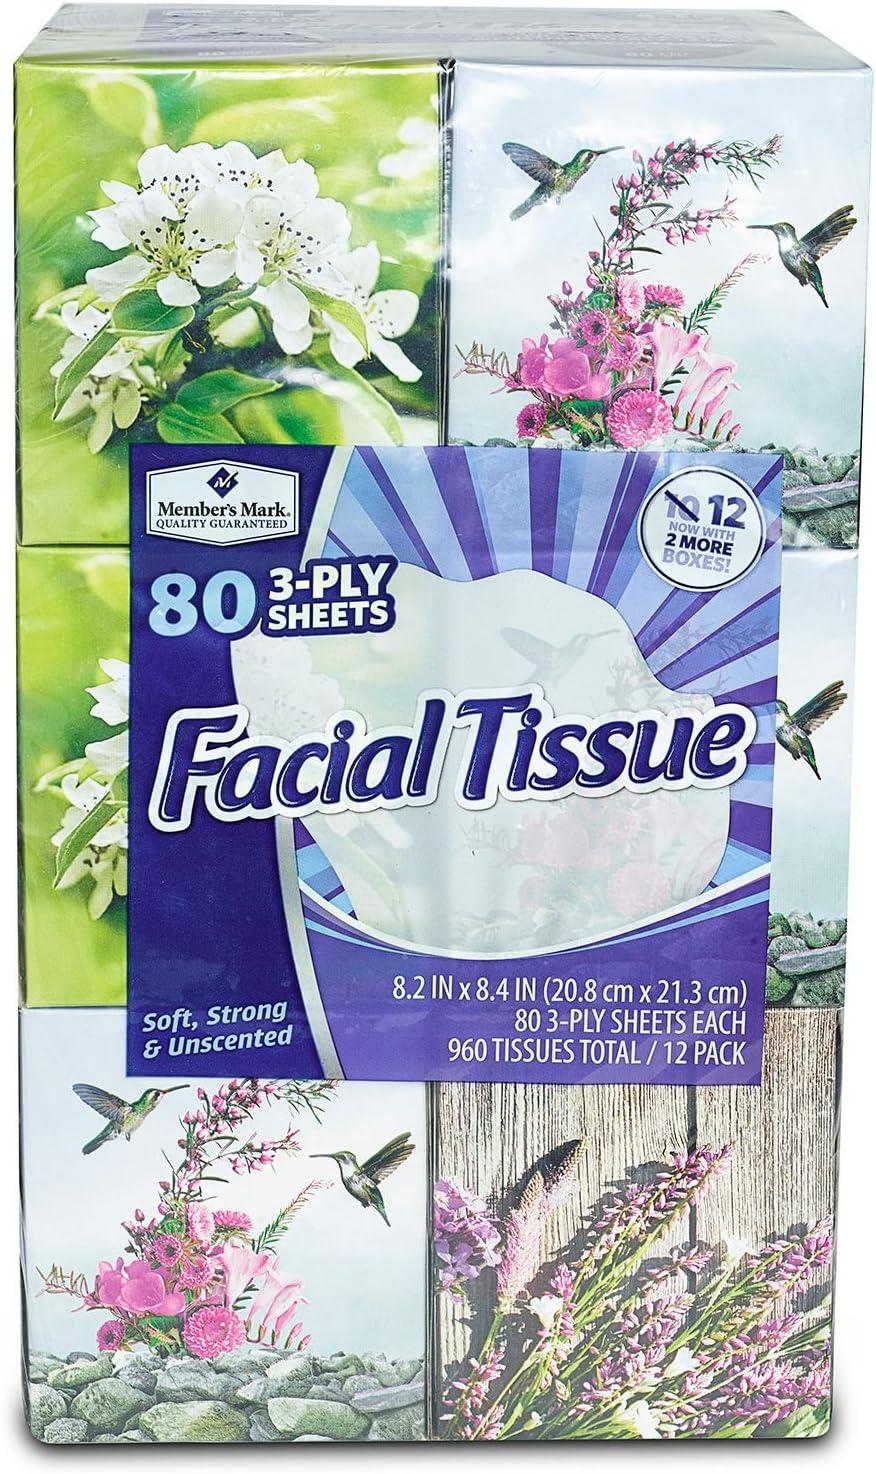 960 Tissues 12 Cube Boxes Ultra Soft Facial Tissues 80 3-Ply Tissues per Box